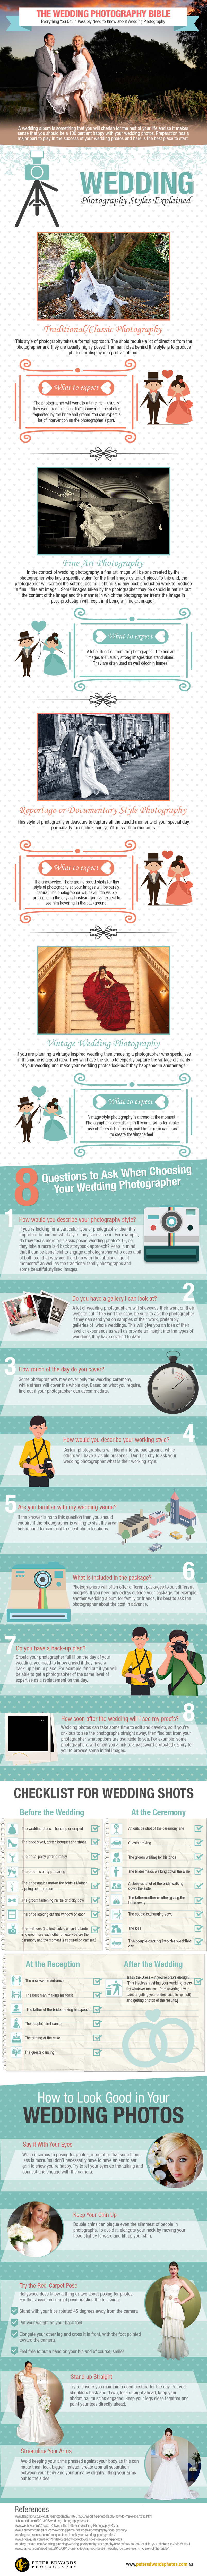 The Wedding Photography Bible